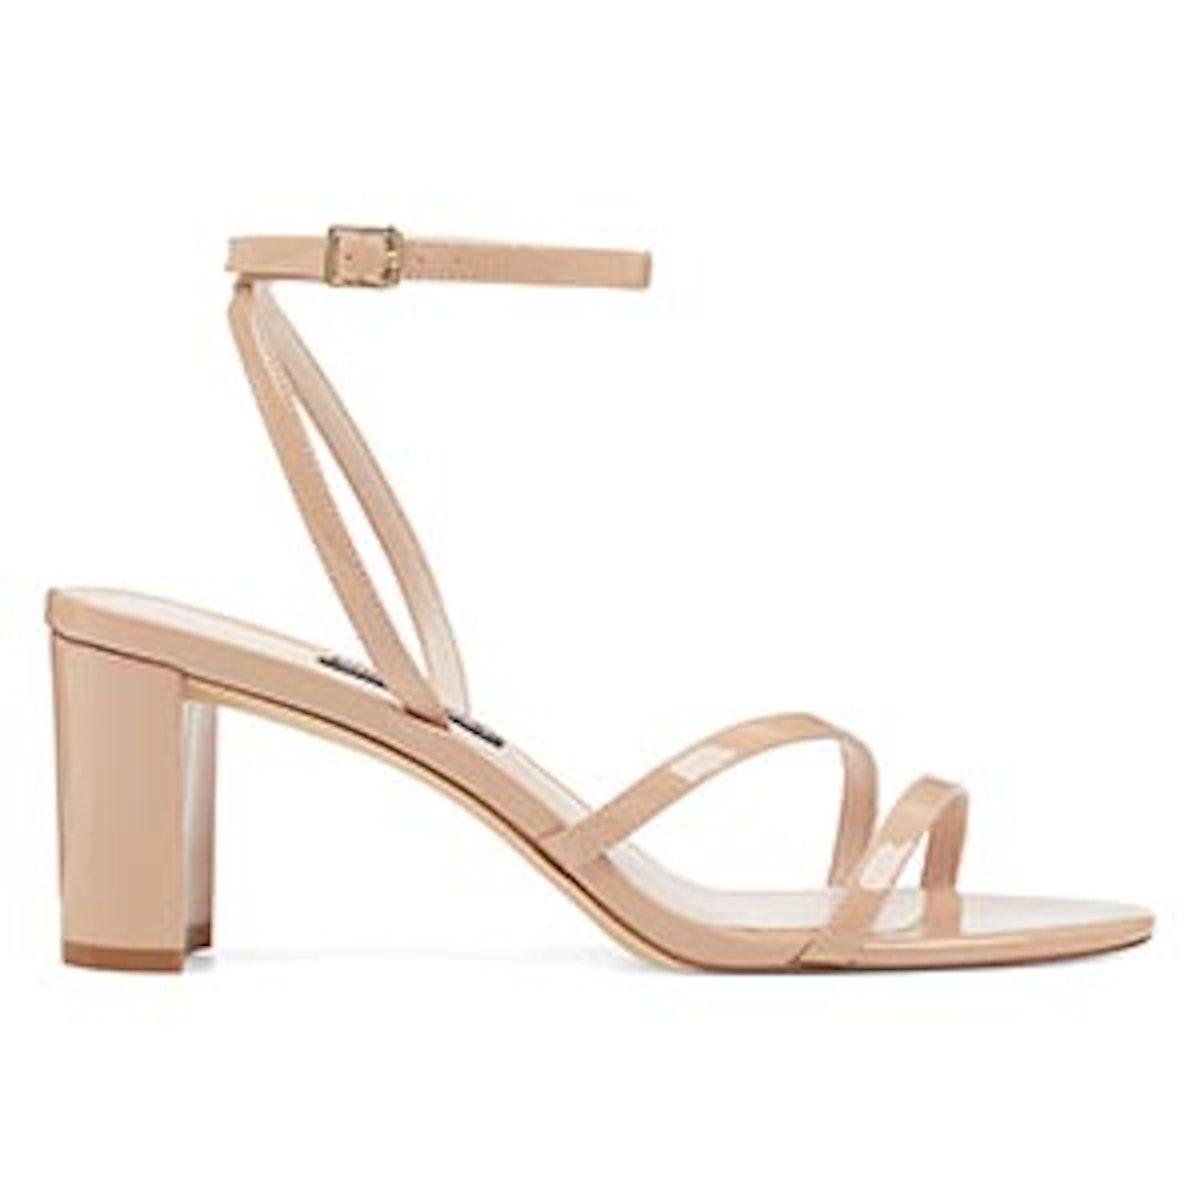 Parlanda Ankle Strap Sandals